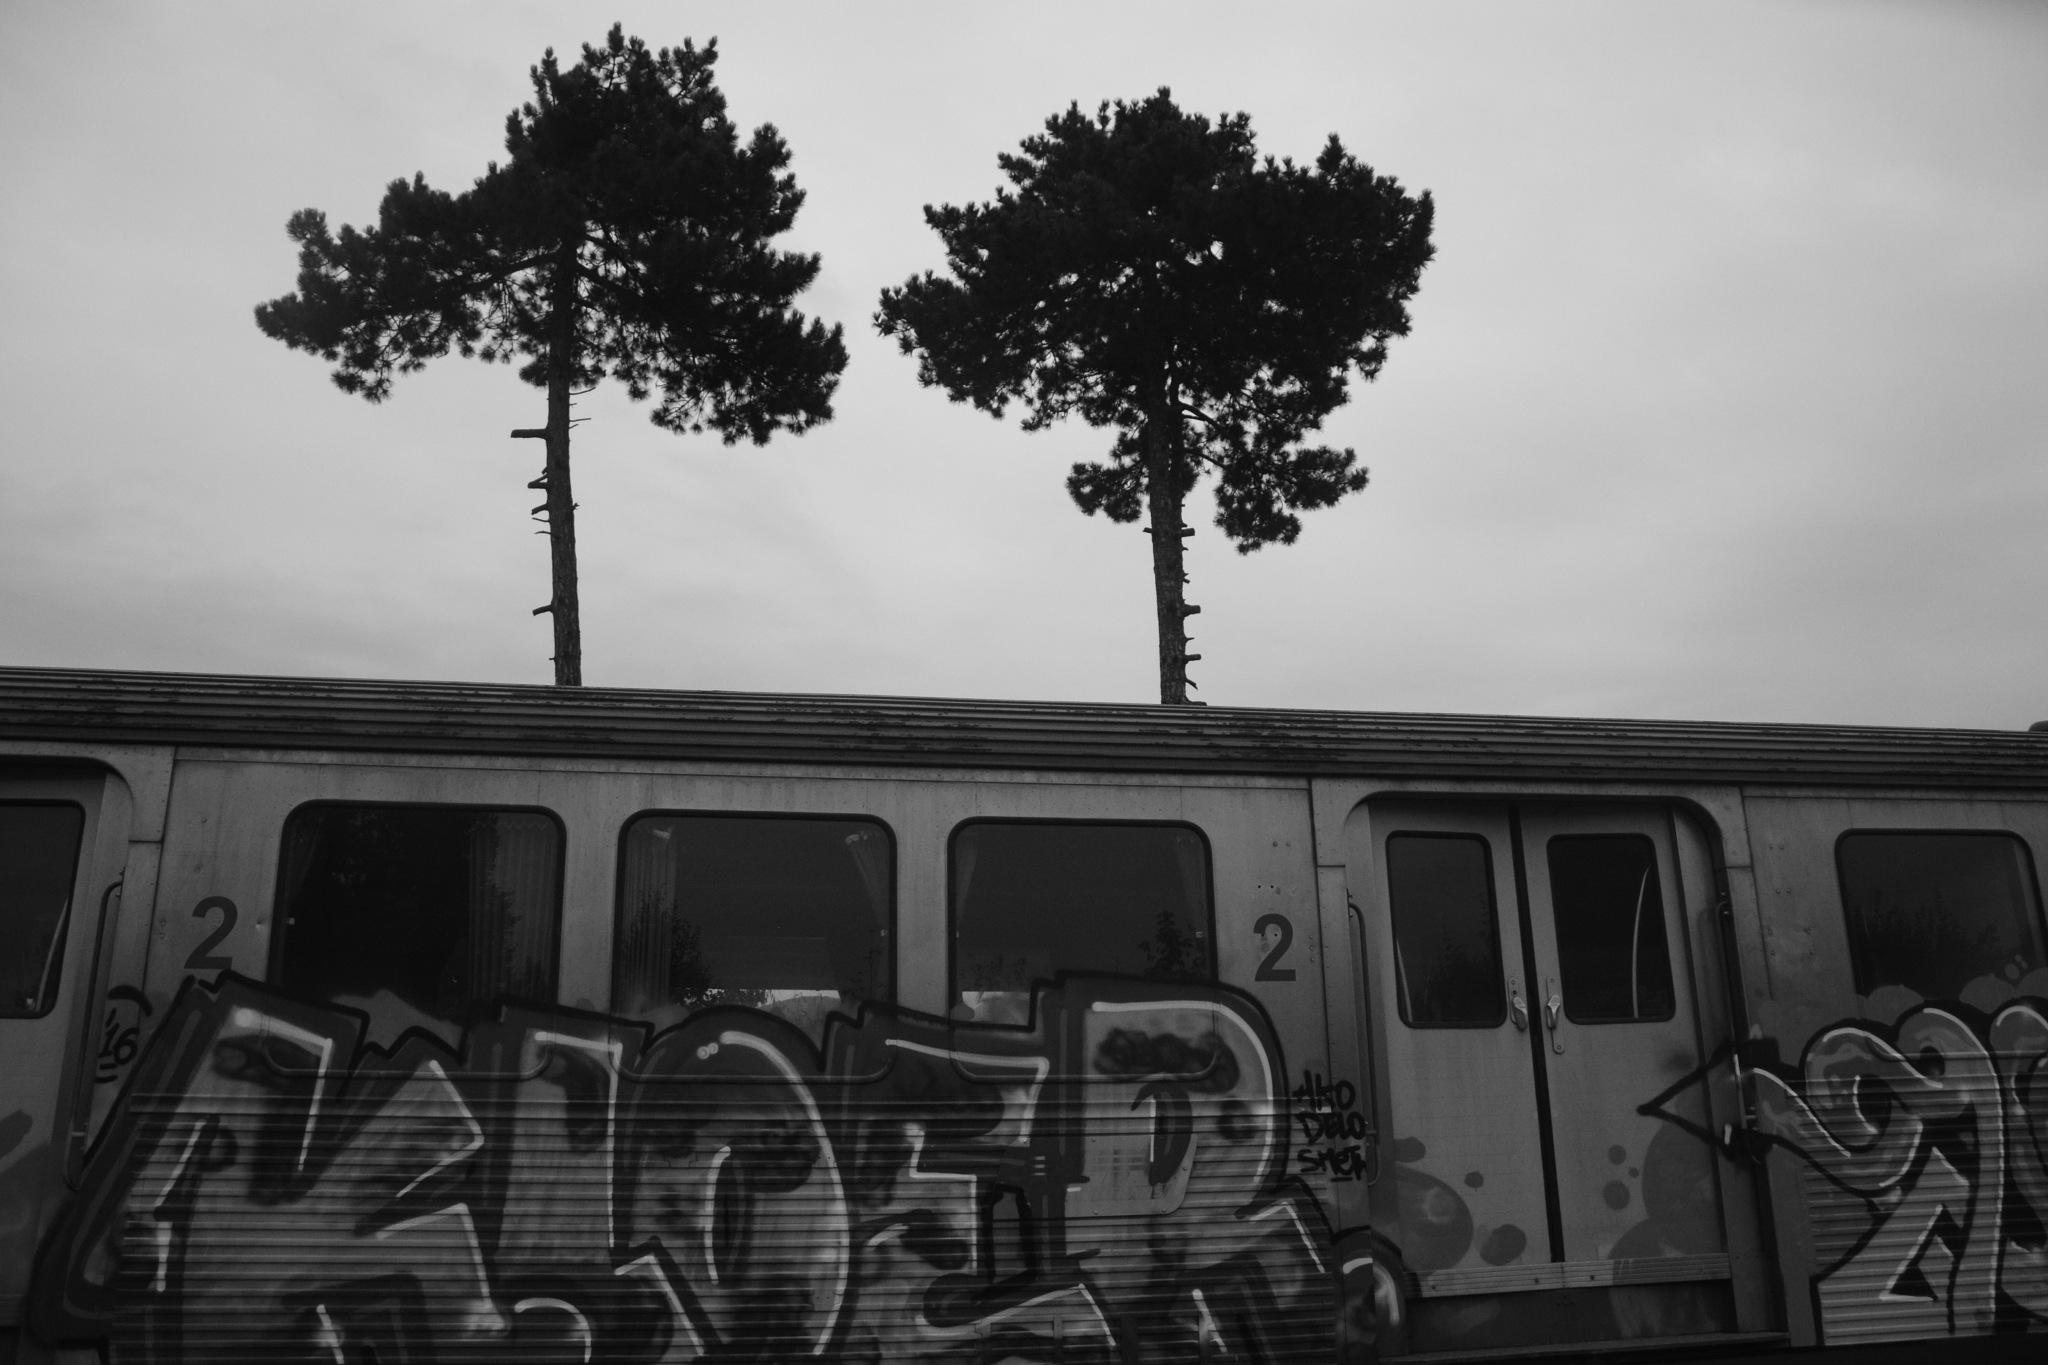 Rasnov Railway Station 6 by GraemeLeePollard